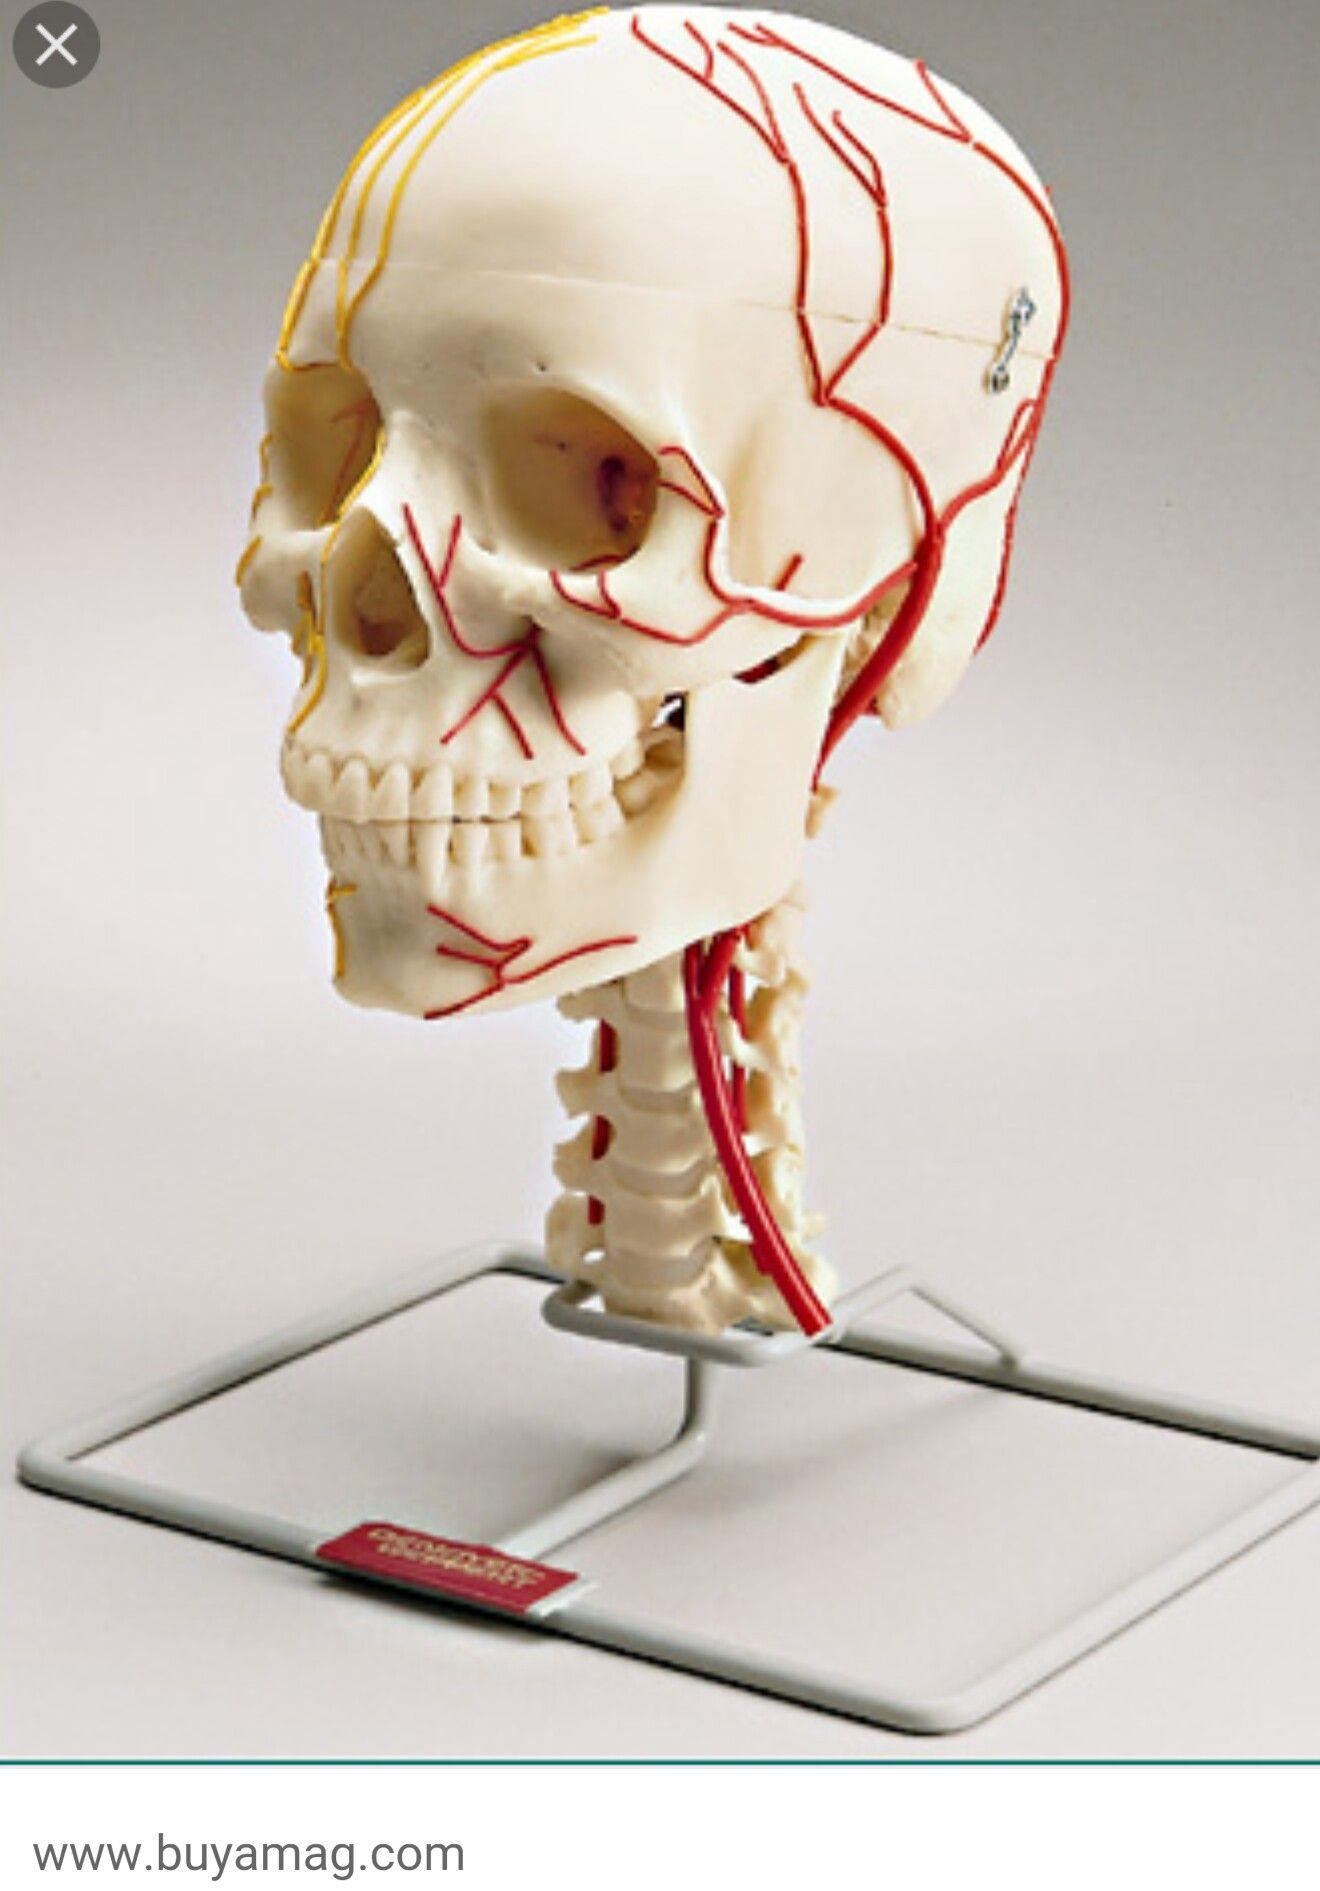 Skull Vessels And Nerves Map Head Neck Anatomy Pinterest